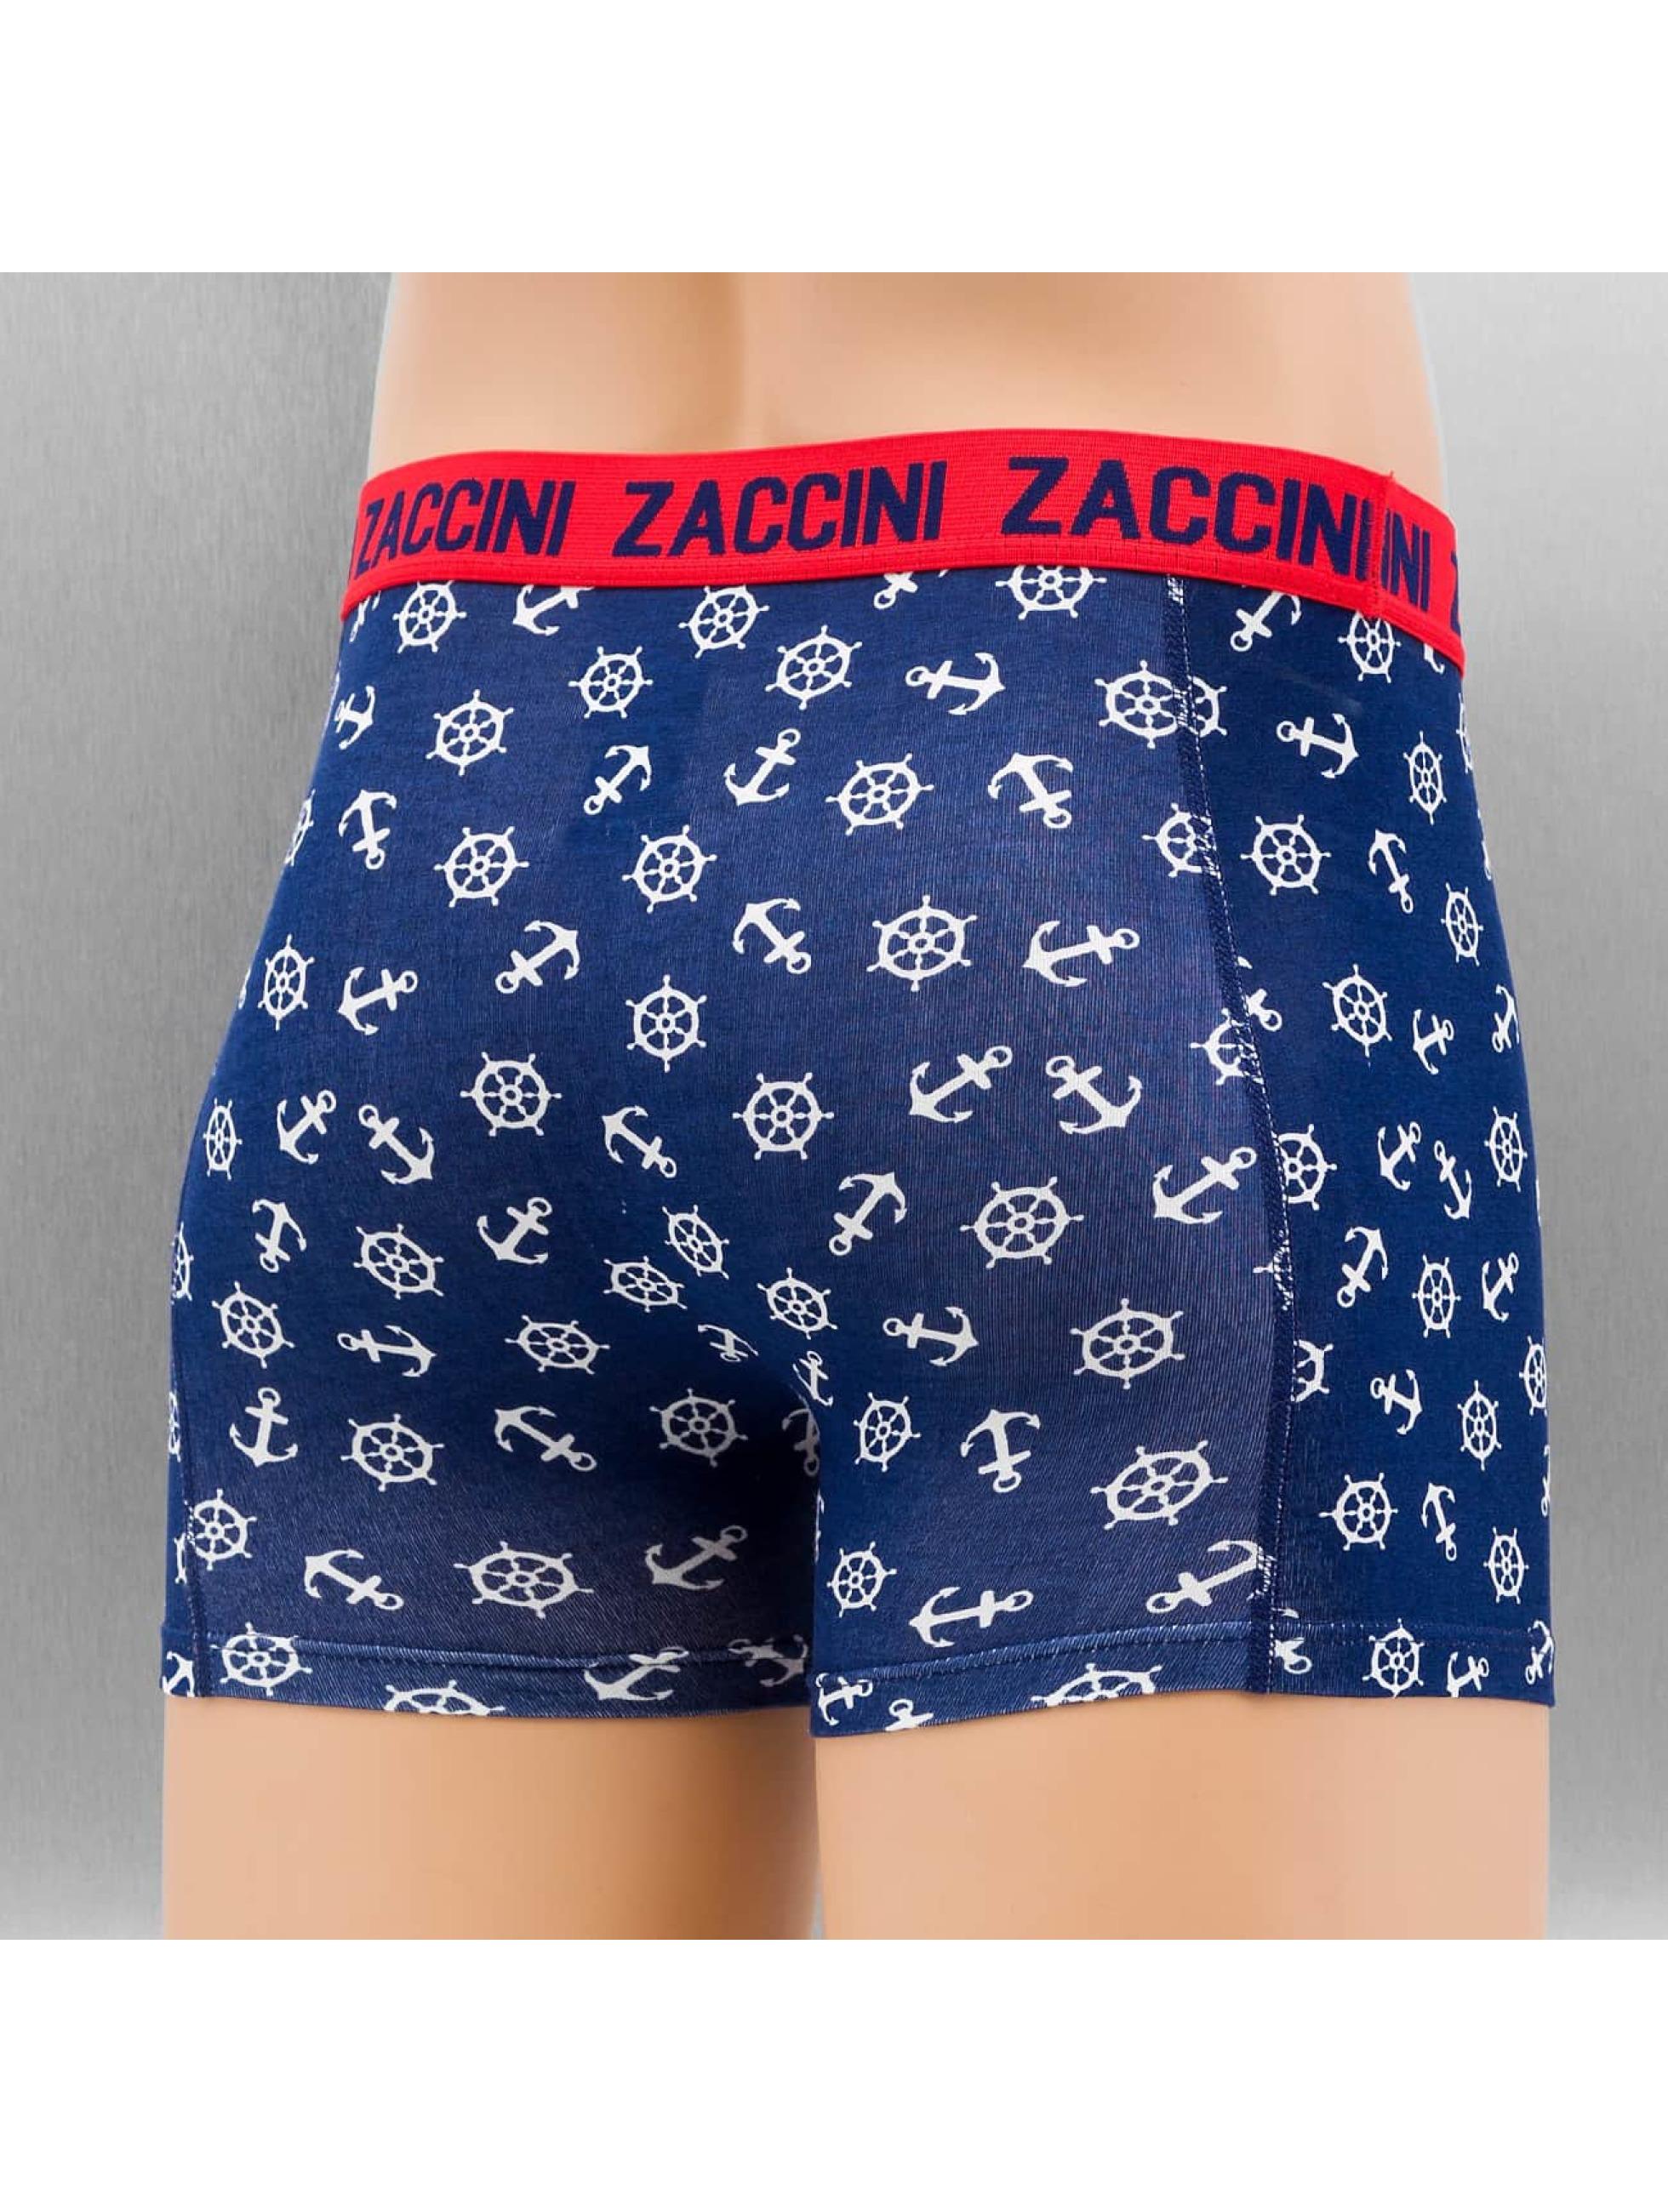 Zaccini Семейные трусы Nautical 2-Pack синий